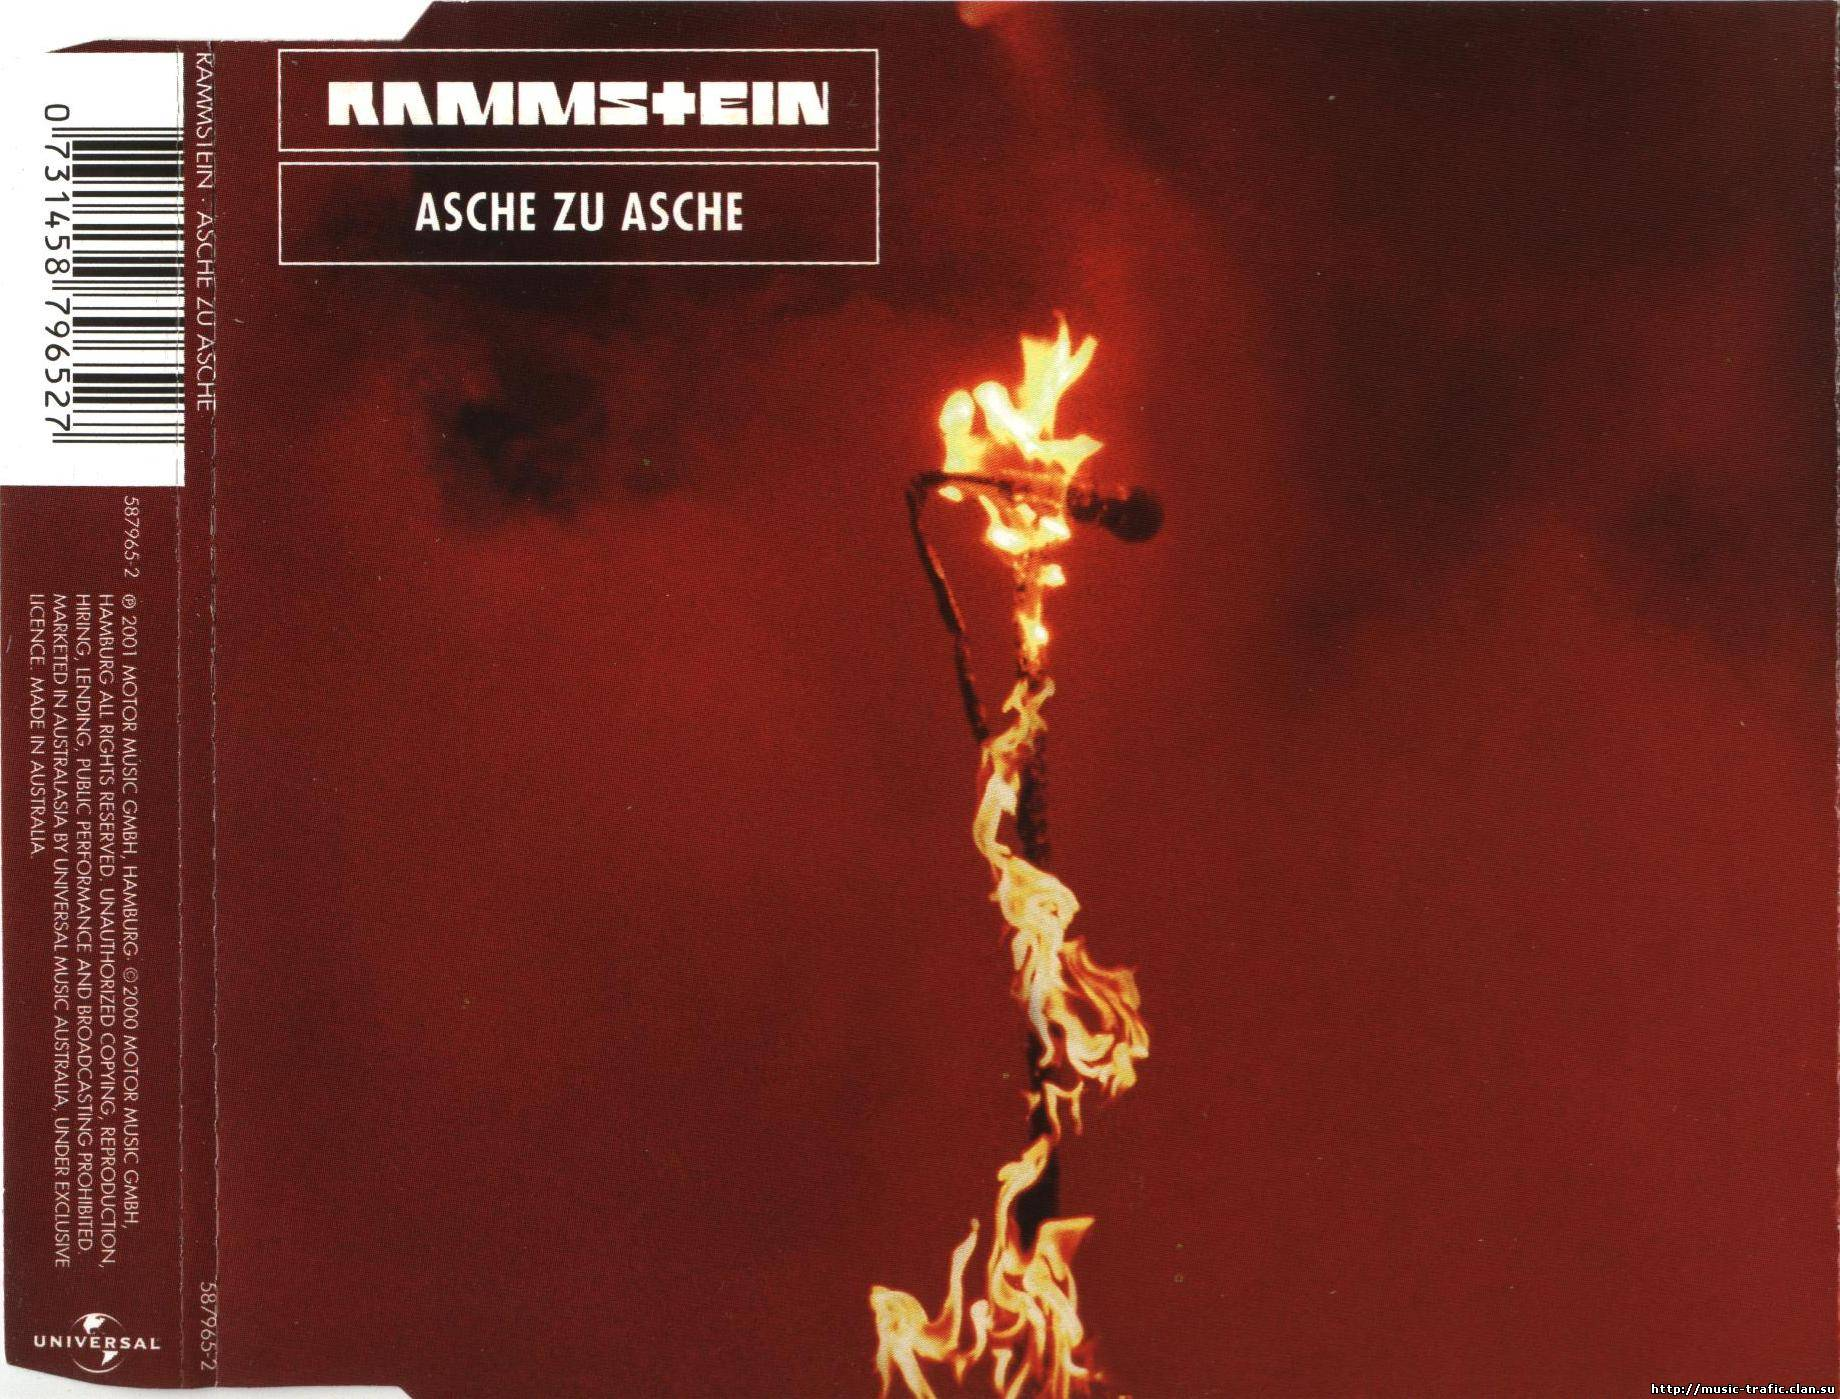 Rammstein asche zu asche скачать бесплатно mp3